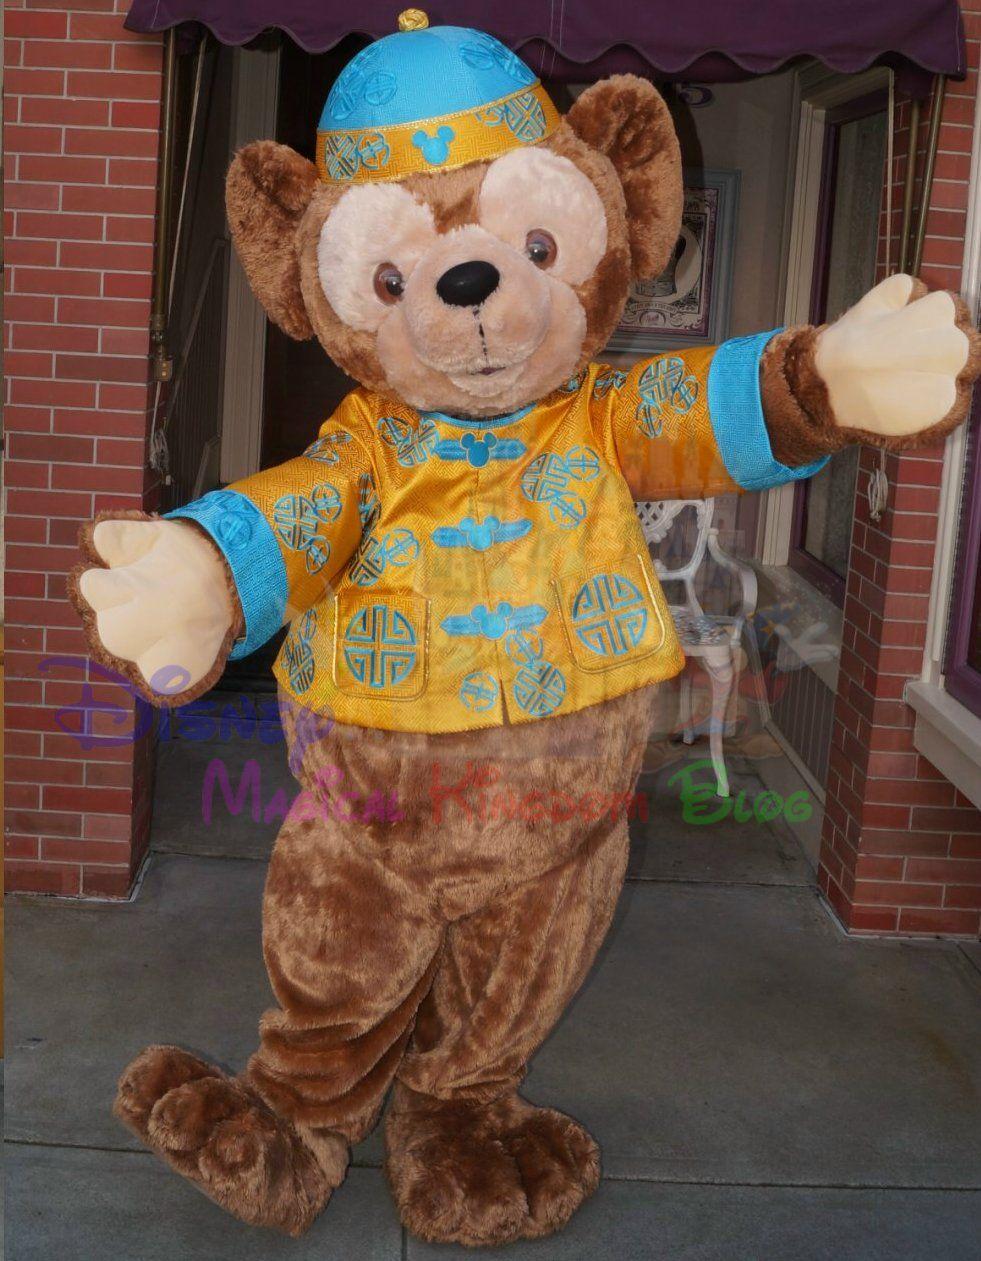 The Happiness Chinese New Year Celebration @ Hong Kong Disneyland (23/1/2014 - 16/2/2014)!